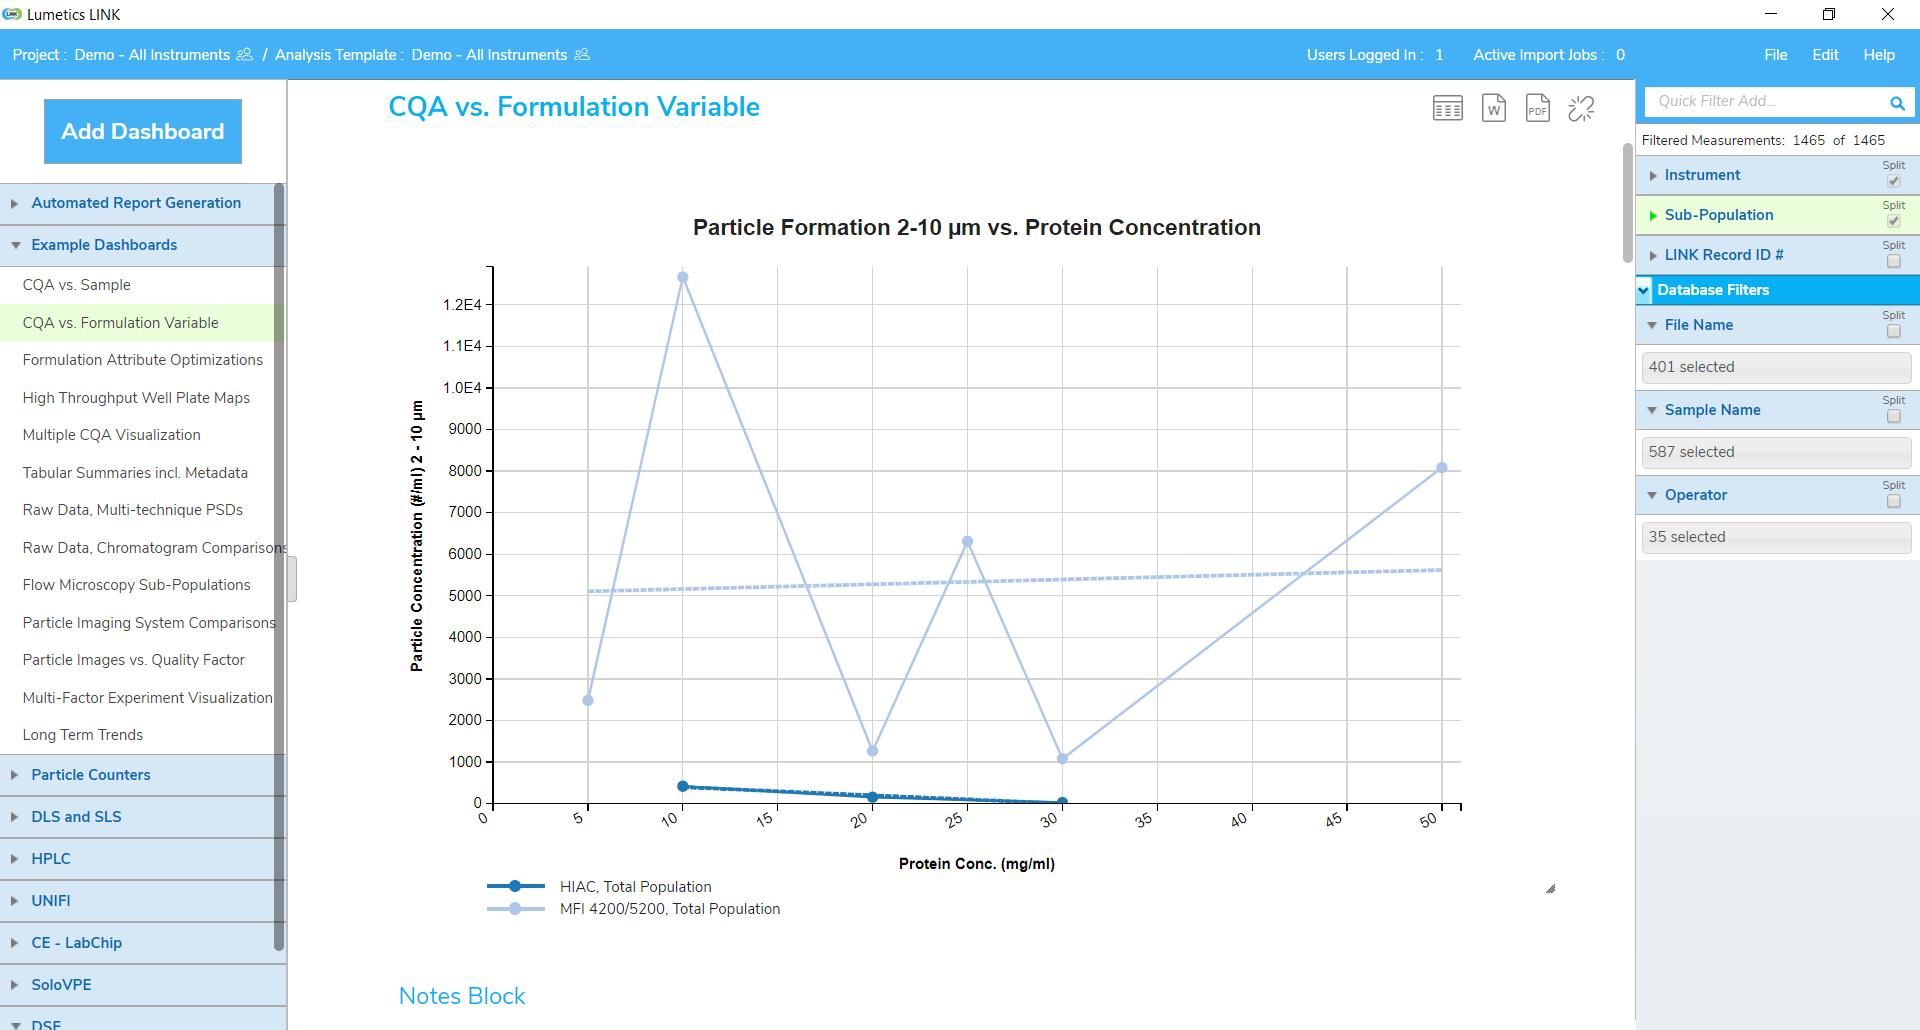 CQA vs. Formulation Variable